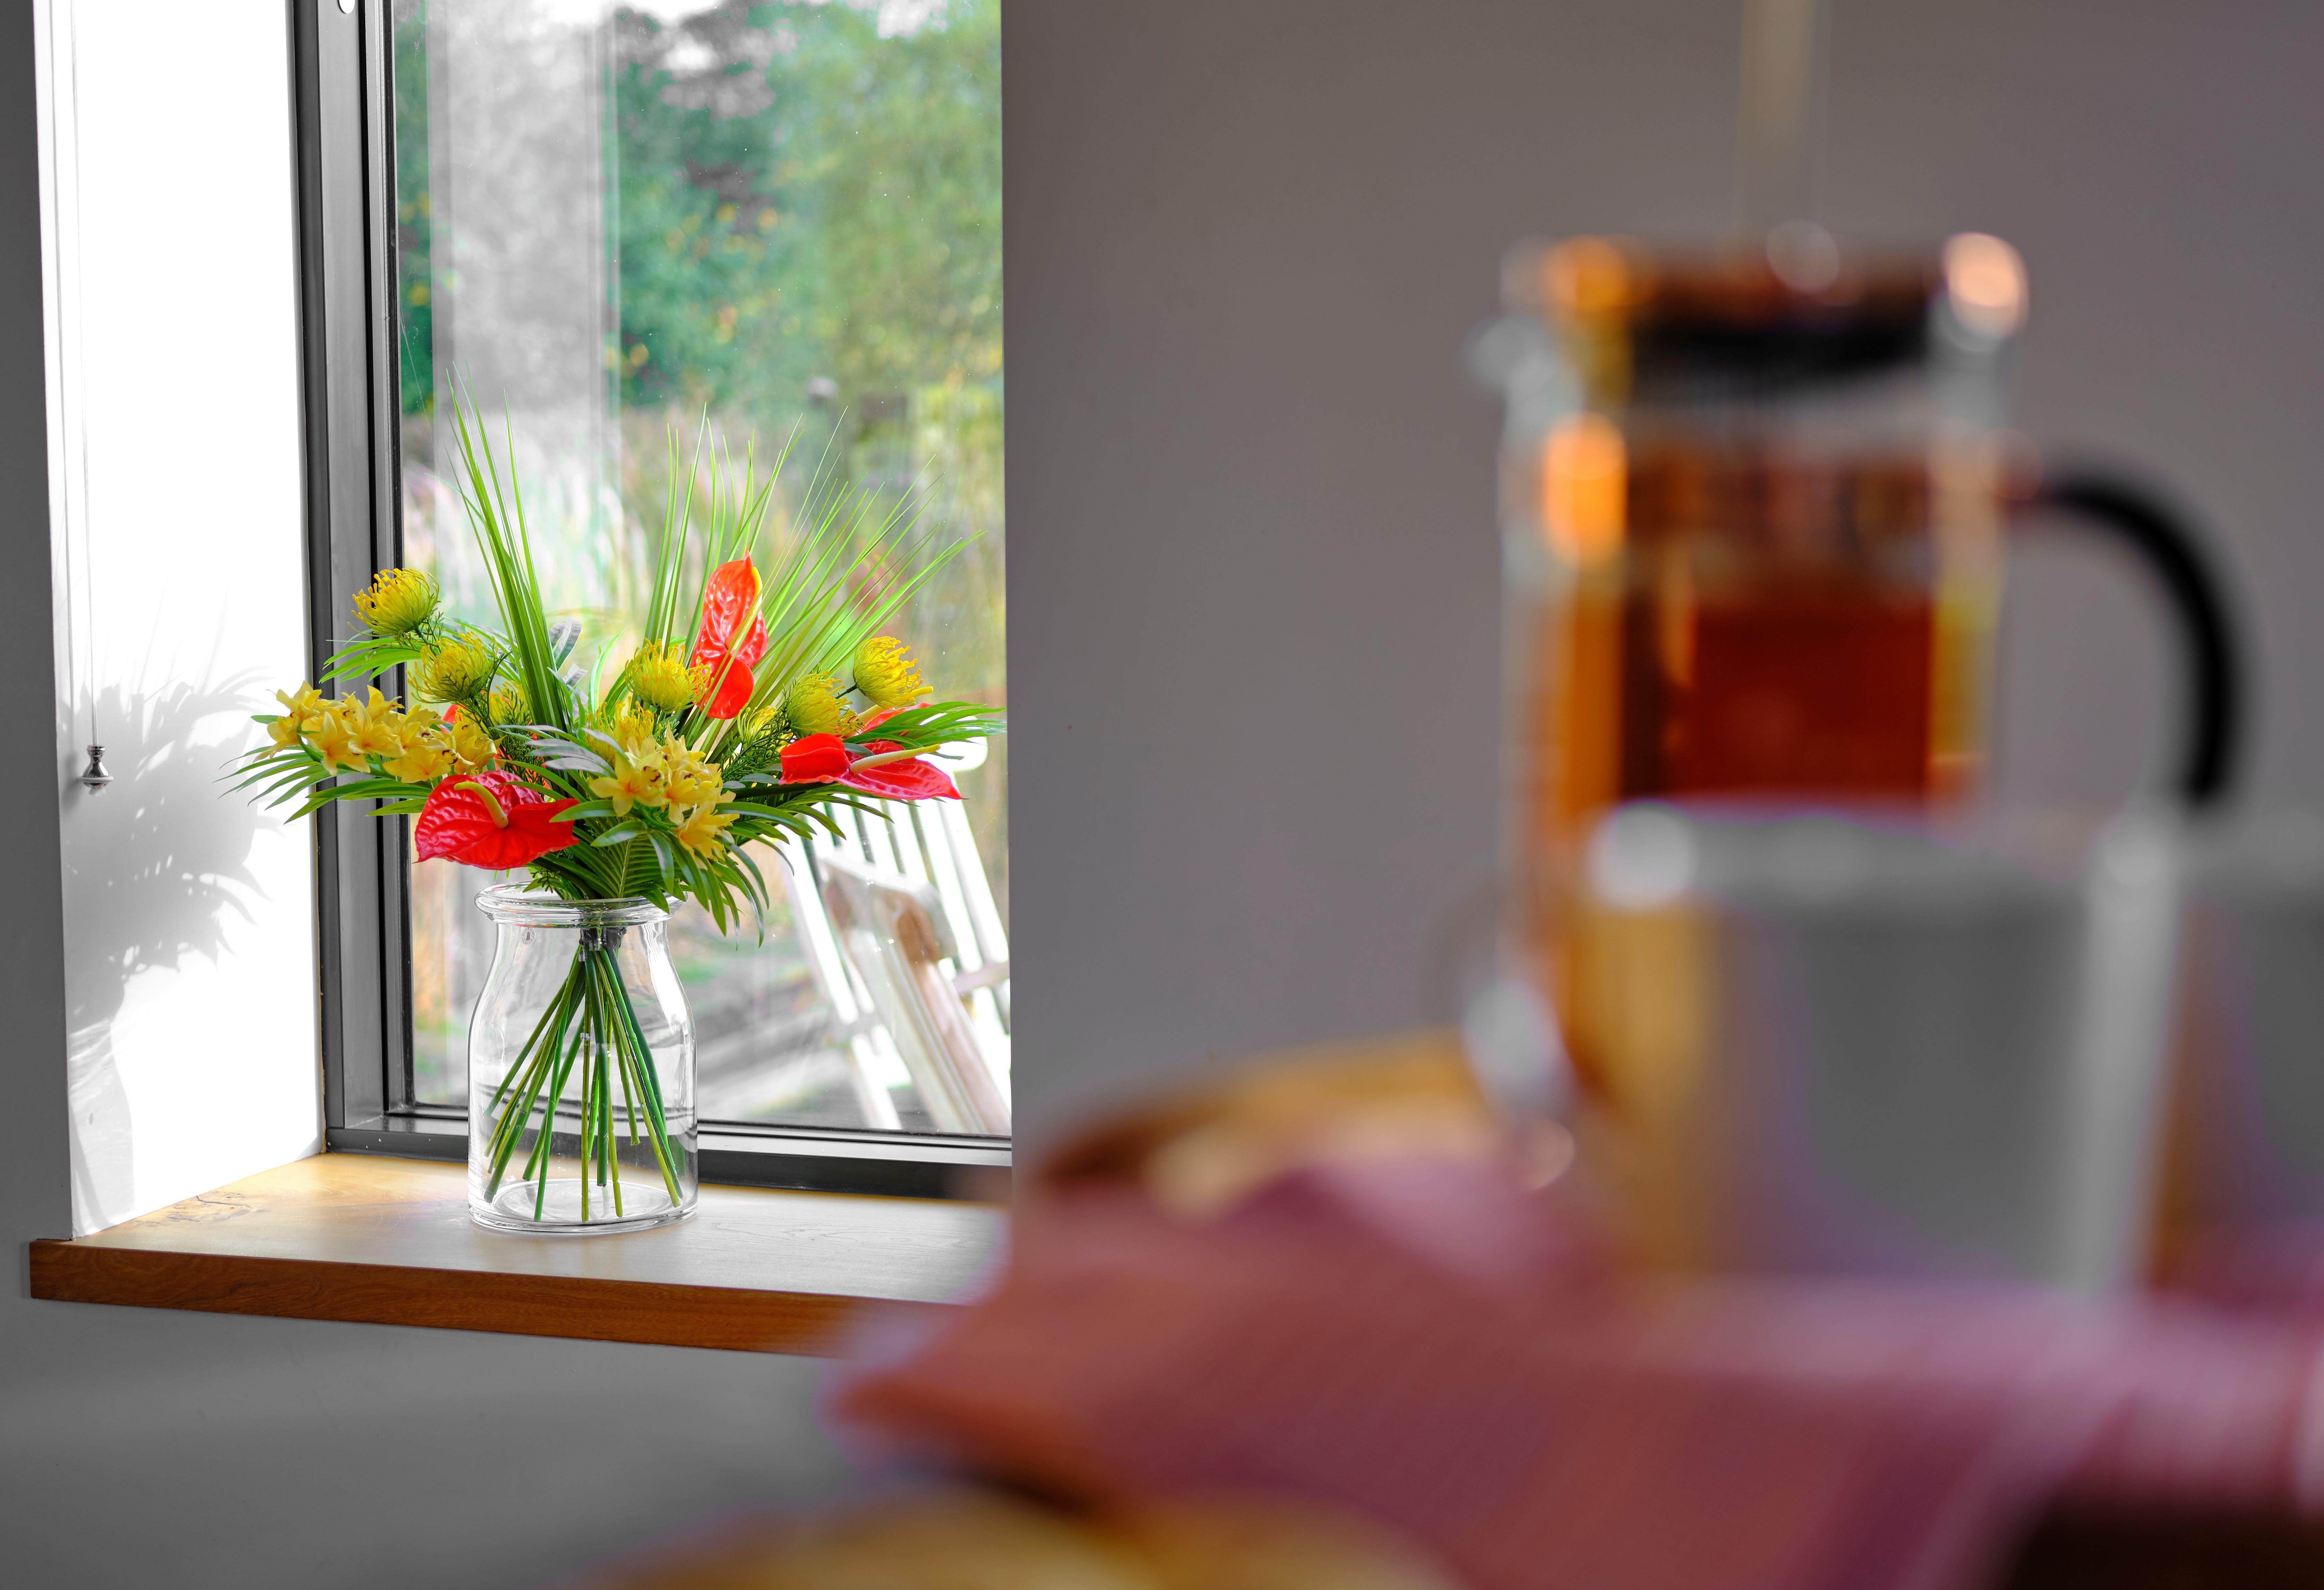 Artificial bahama mama bouquet on window sill